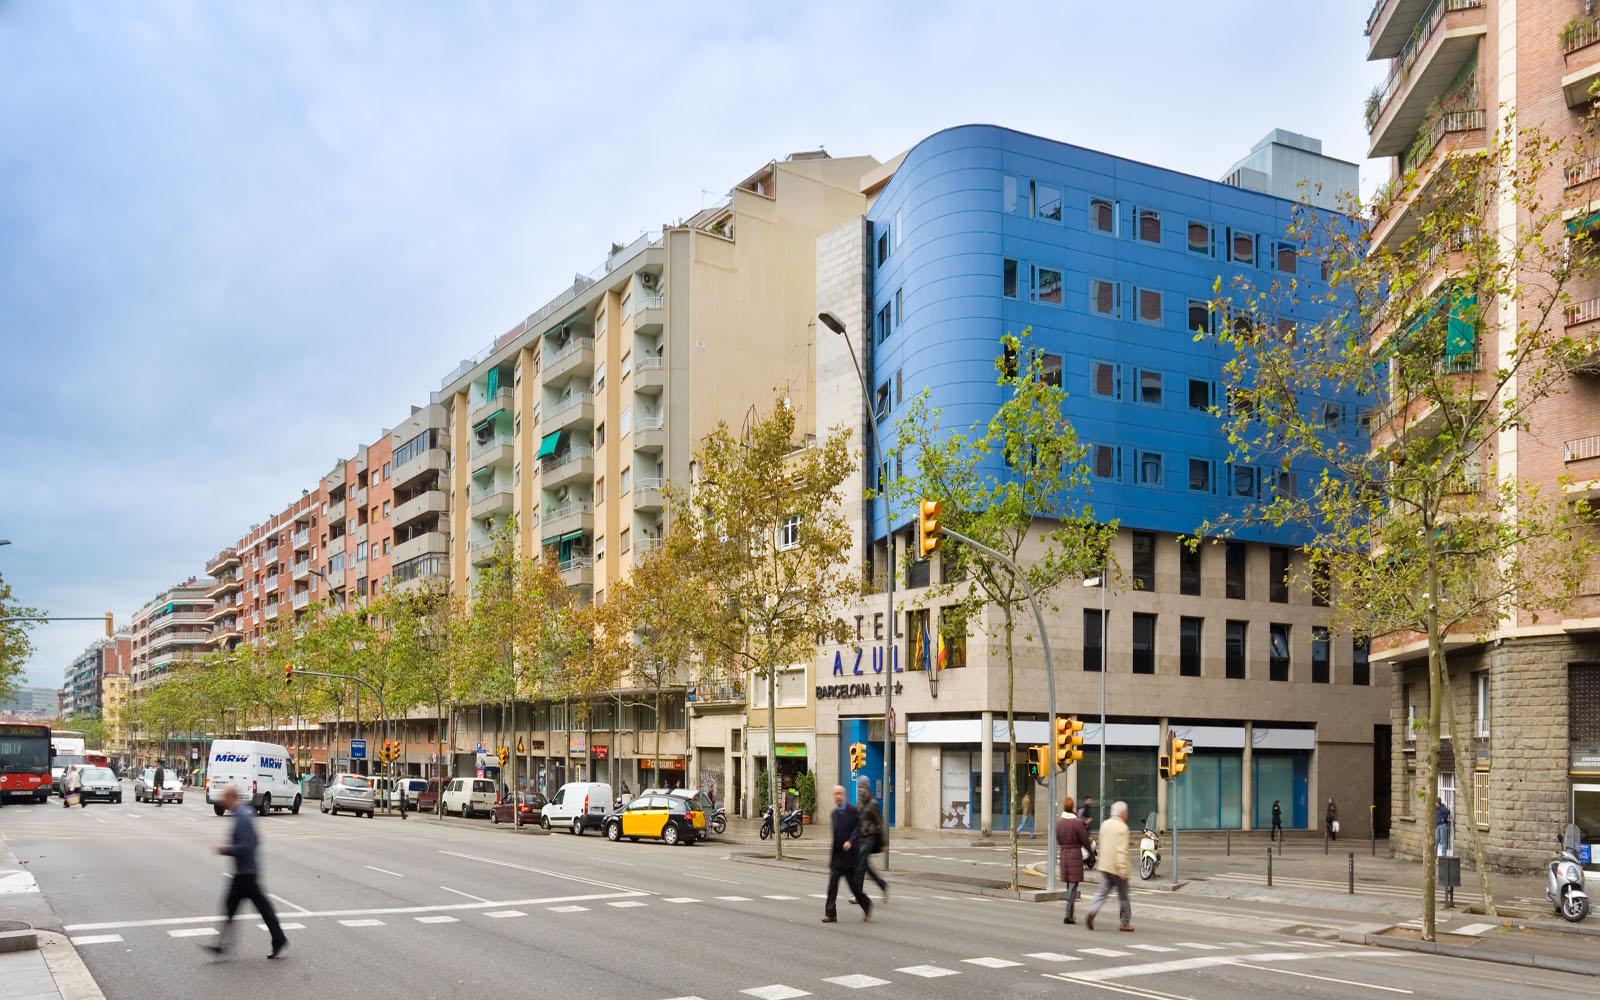 Hotel acta azul barcelona web oficial for Hotel de paris barcelona